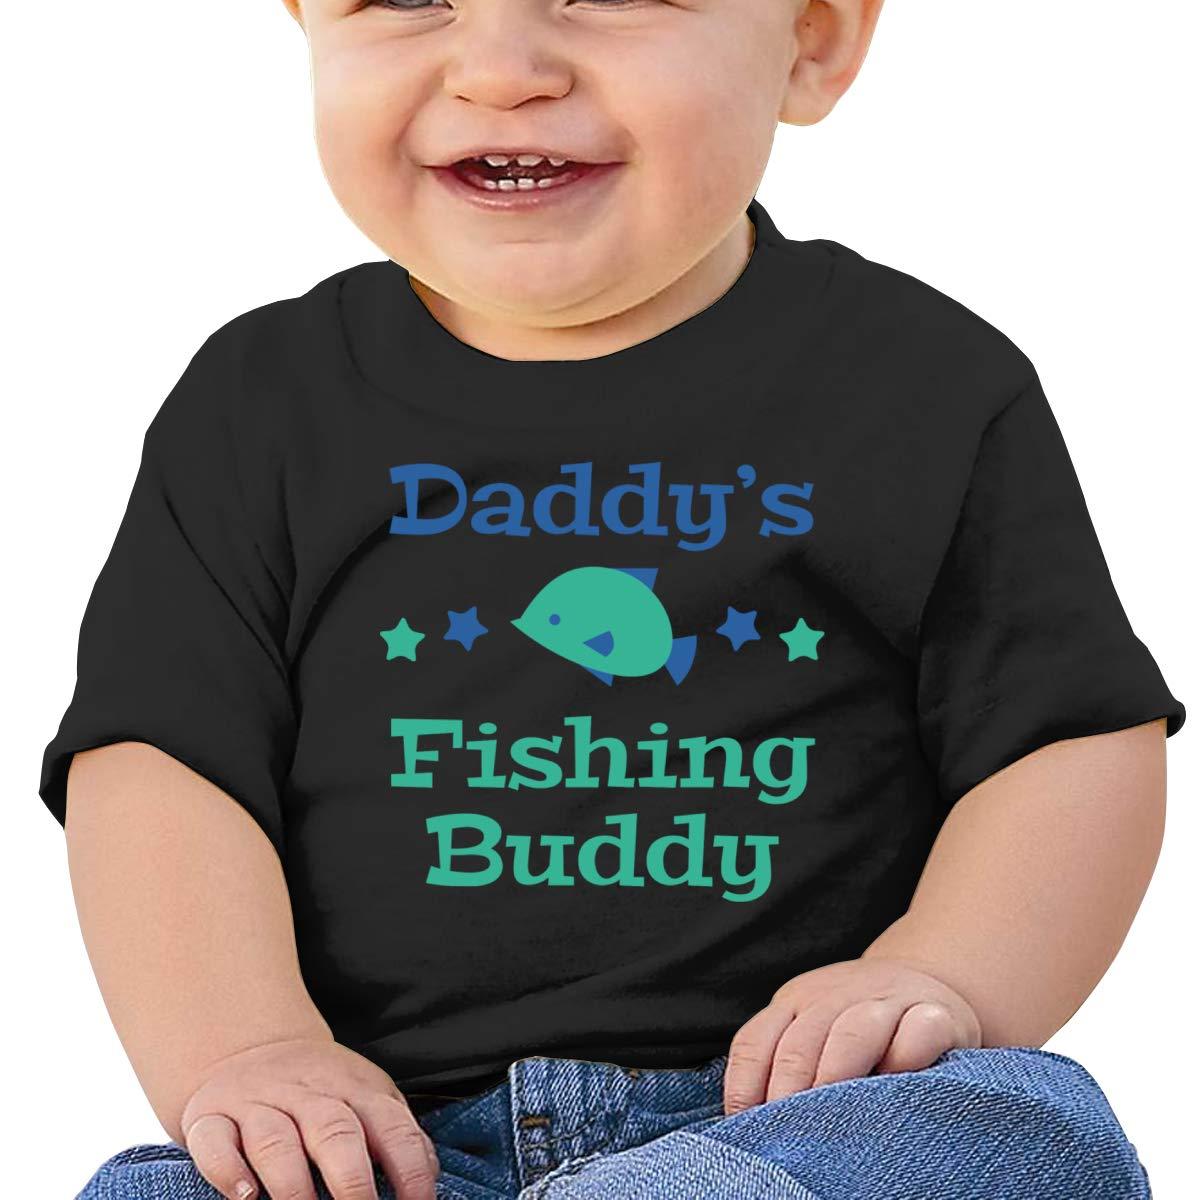 Arsmt Daddys Fishing Buddy Toddler Short Sleeve Shirts Girls Birthday Gift